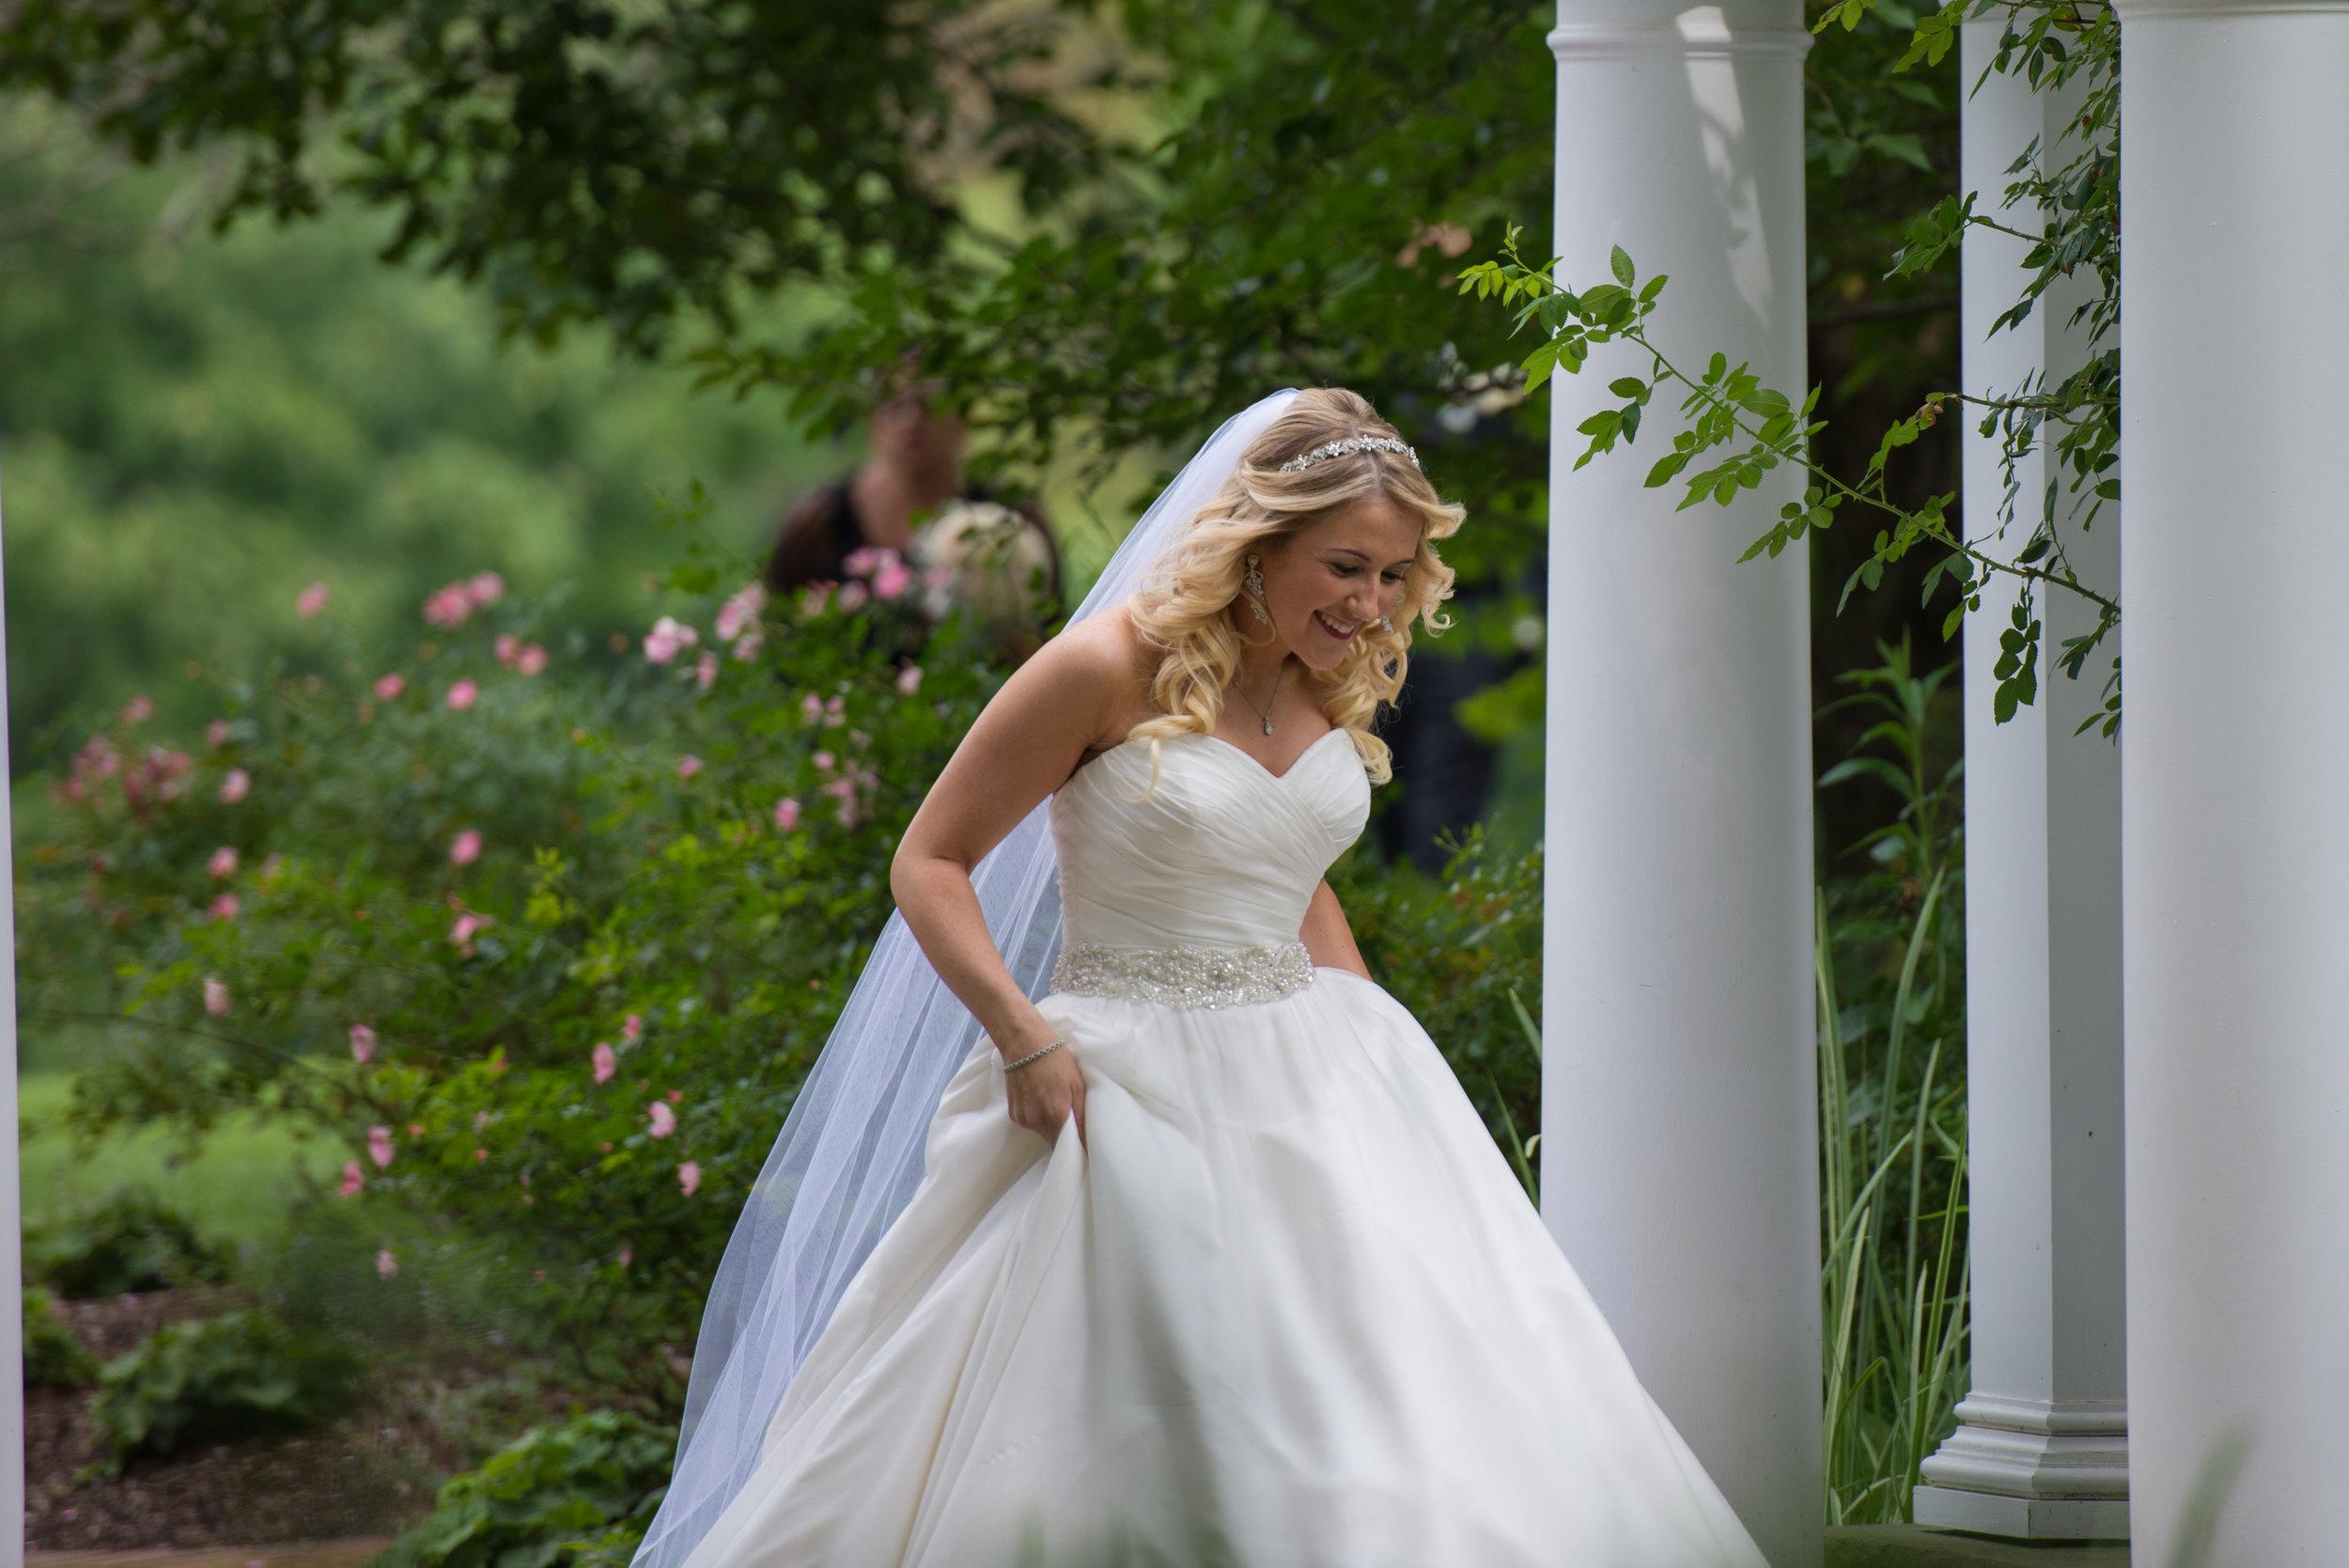 Wedding First Look Photos00911.jpg